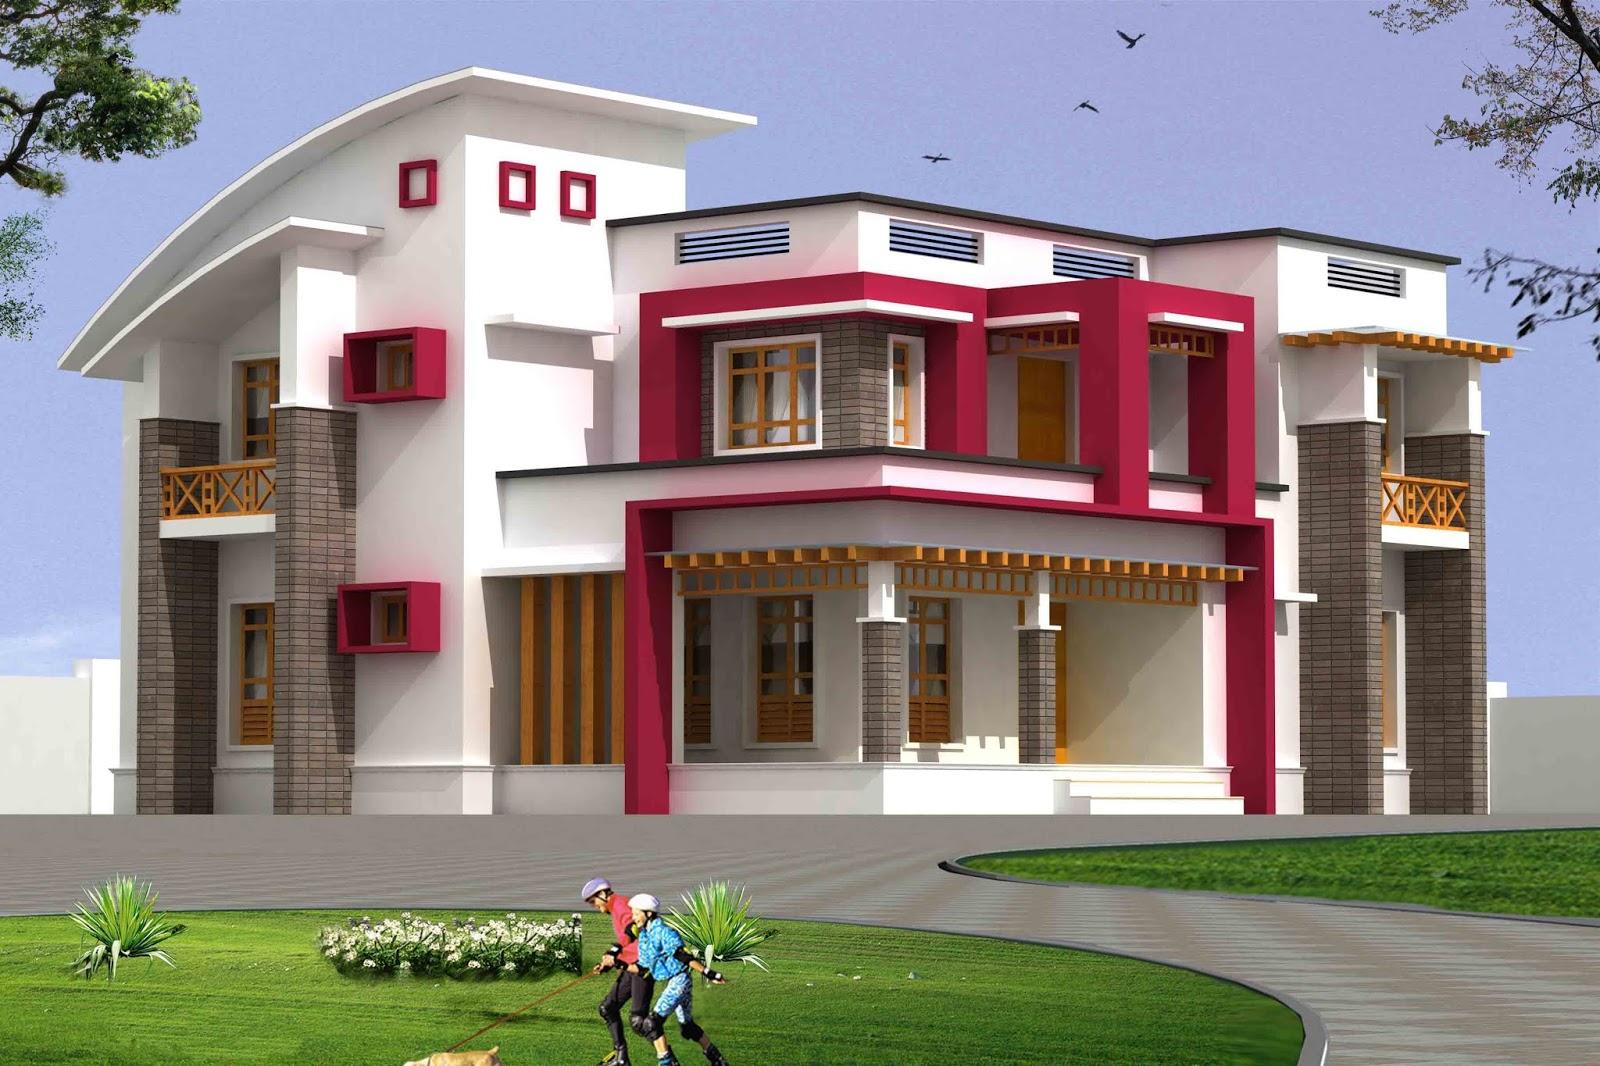 62 Lakh 4 BHK 2900 sq ft Kozhikode Villa